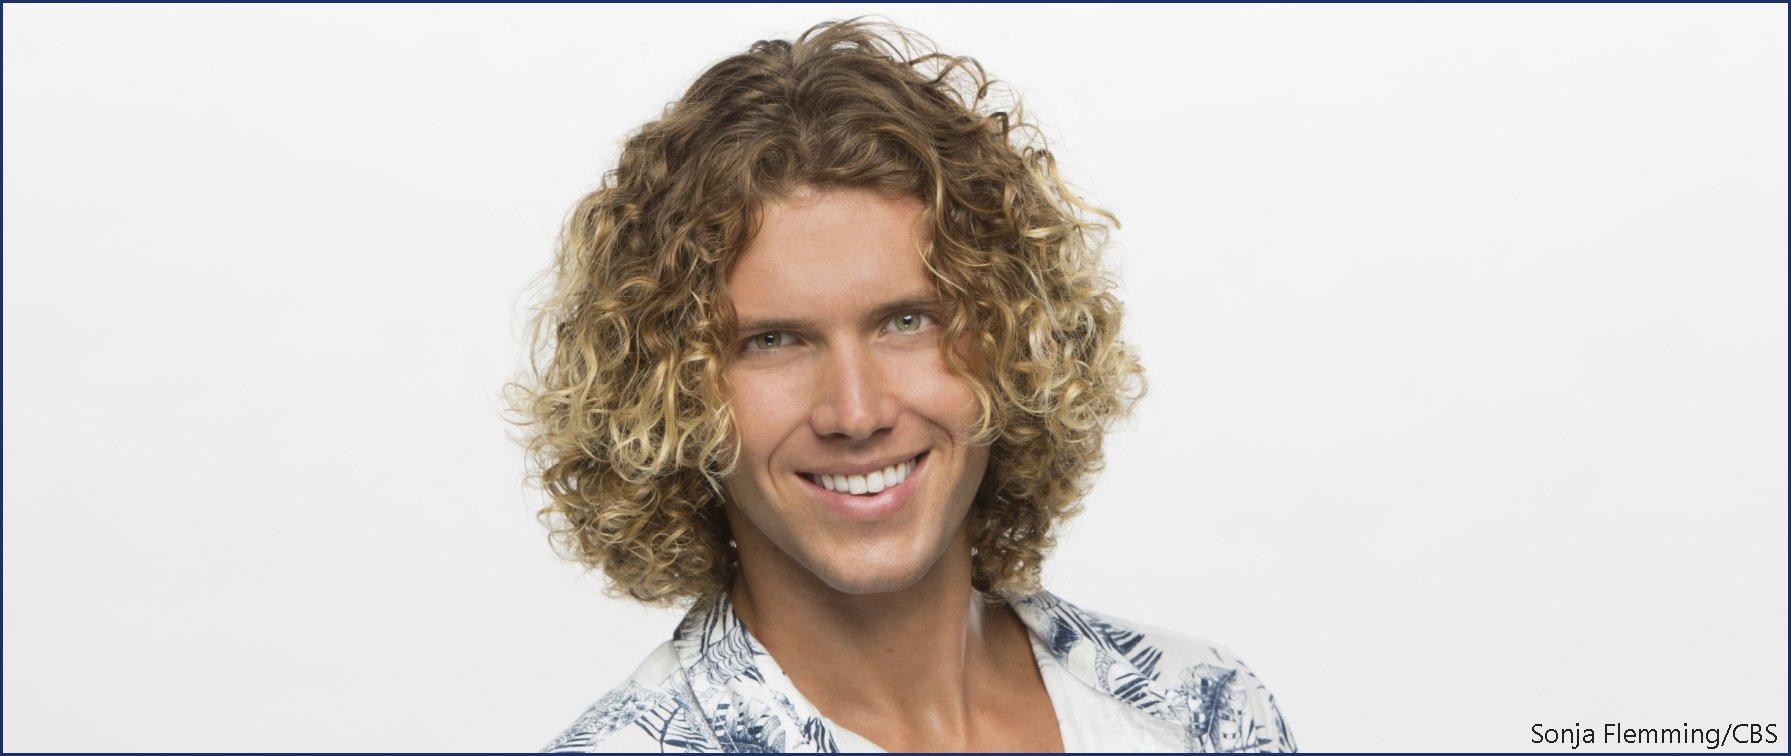 Big Brother' recap: Tyler Crispen wins PoV, Haleigh Broucher